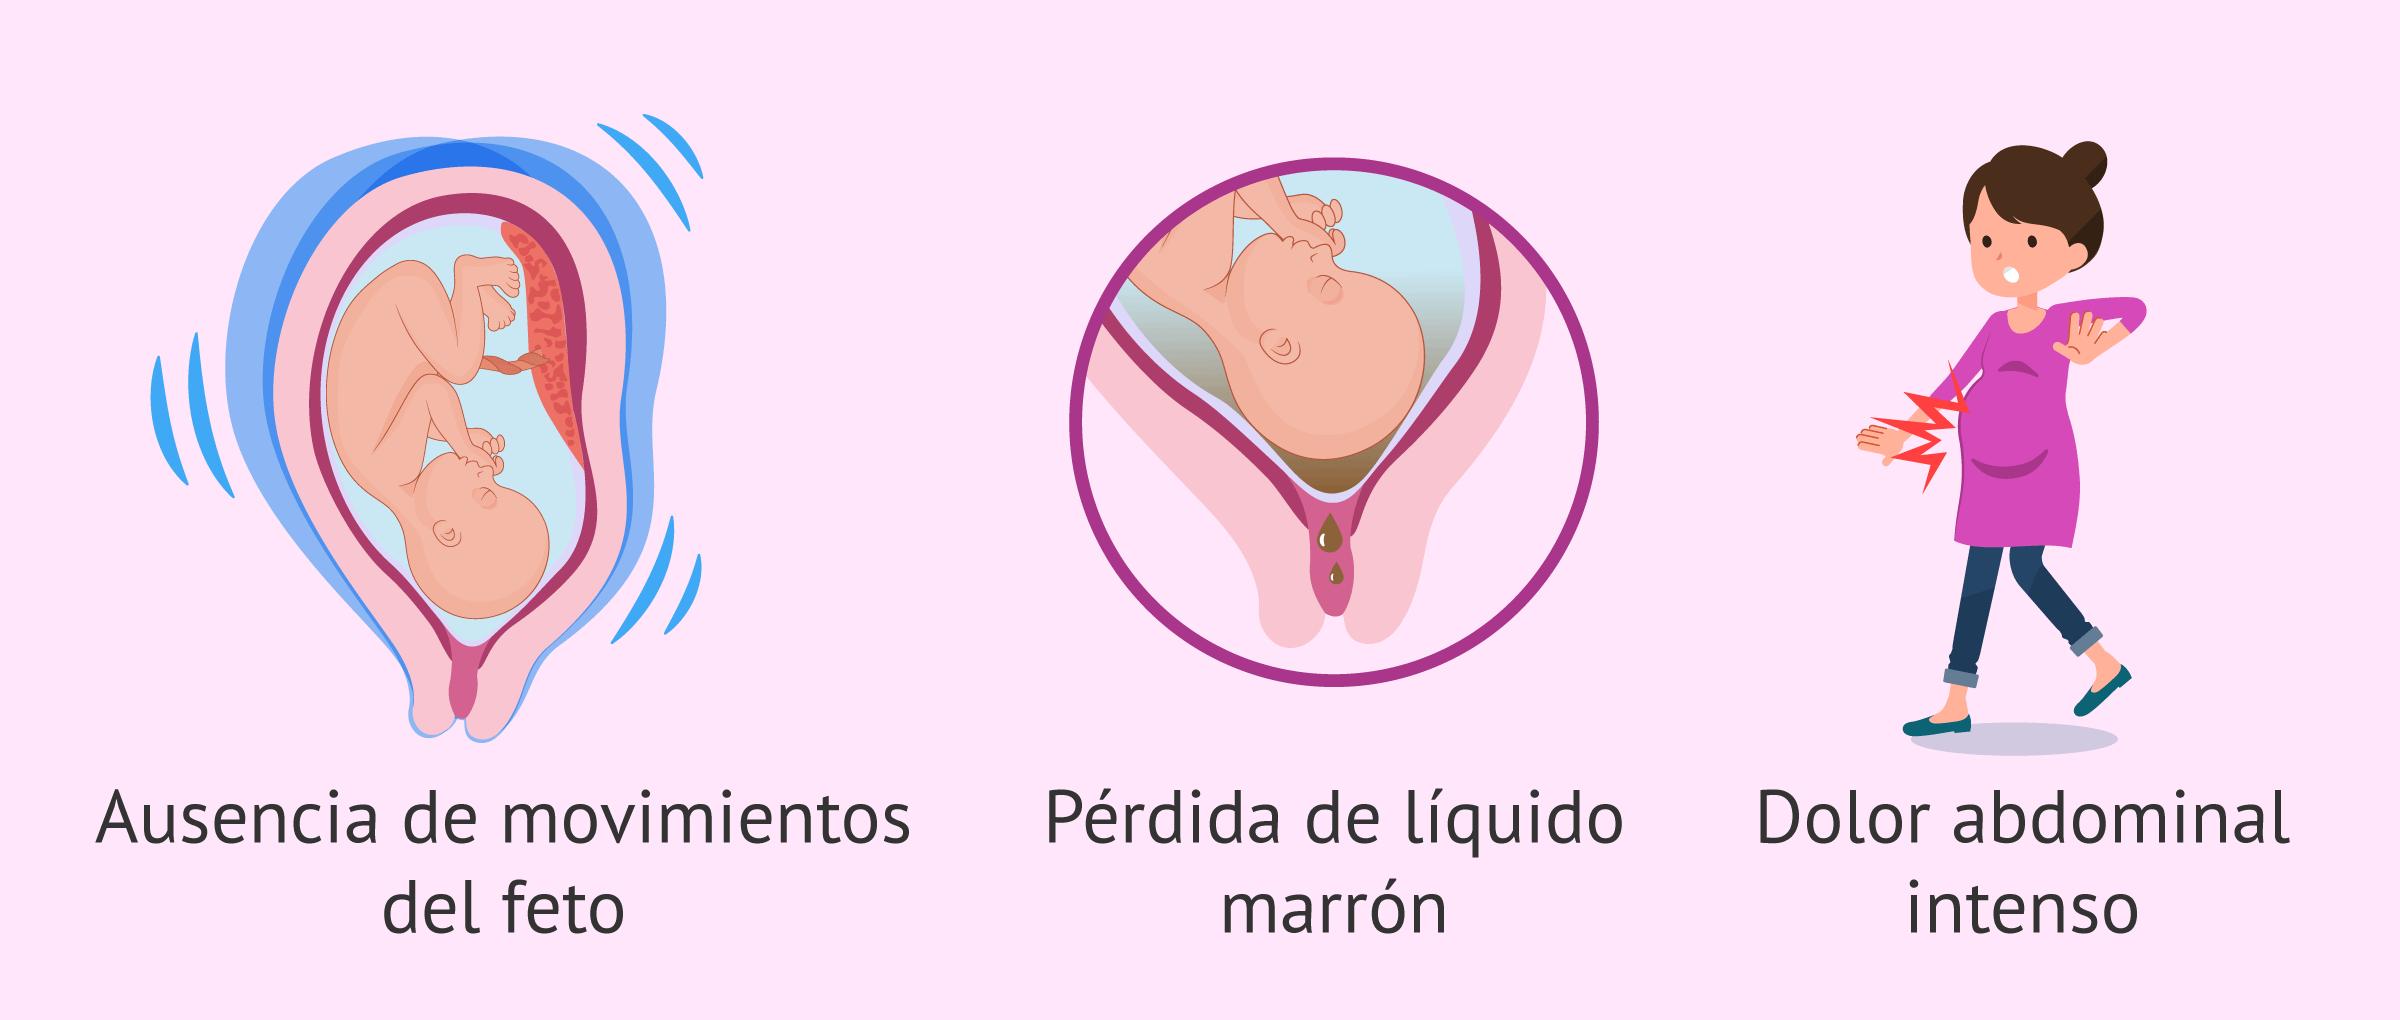 Muerte fetal intrauterina